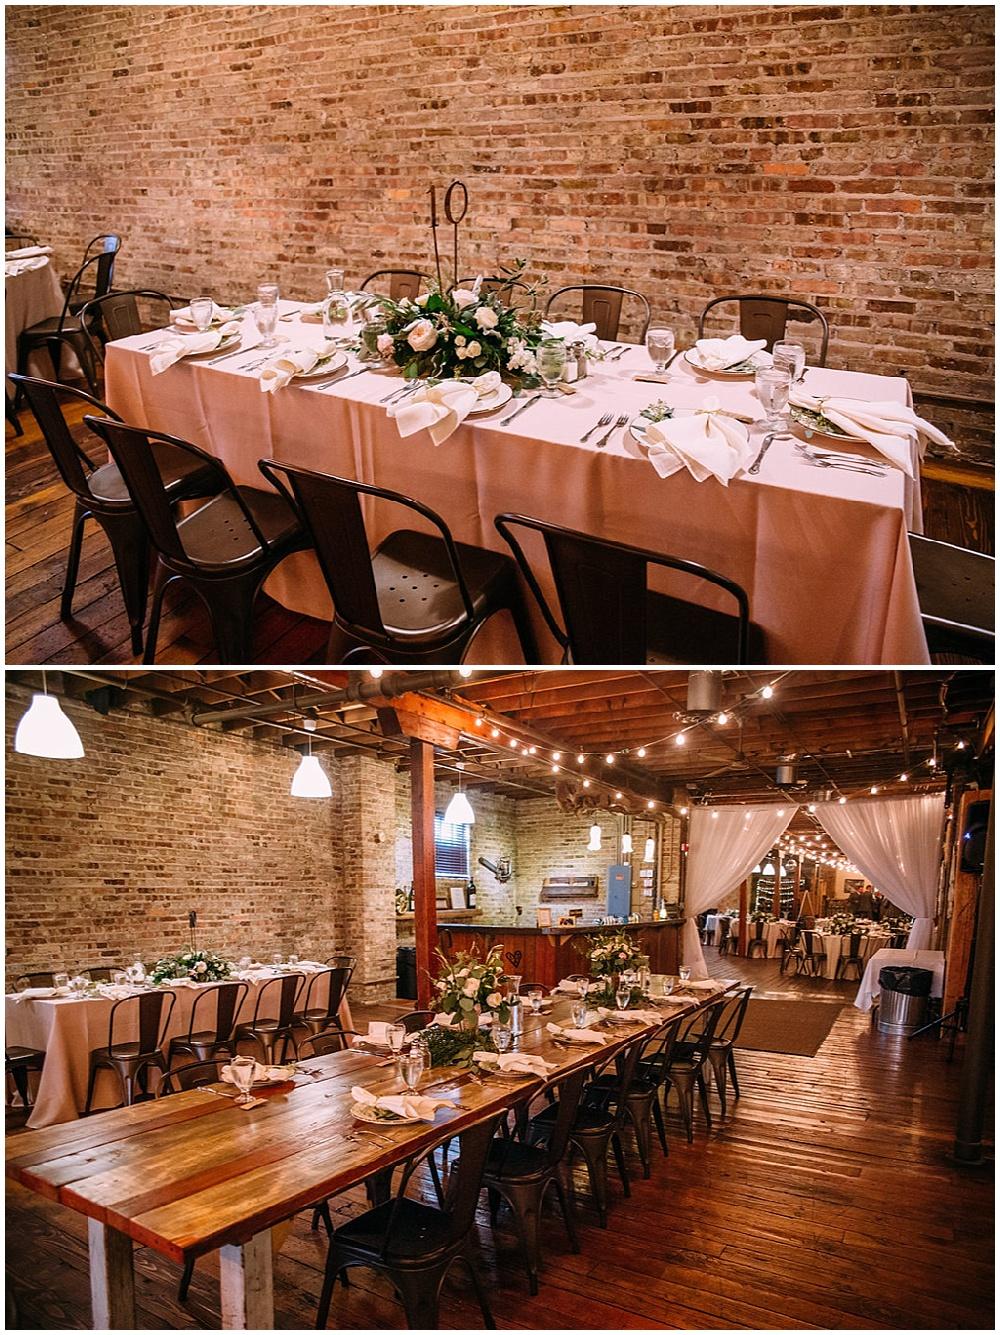 blush reception table with greenery   Chicago urban rustic wedding  Sandra Armenteros Photography   Jessica Dum Wedding Coordination